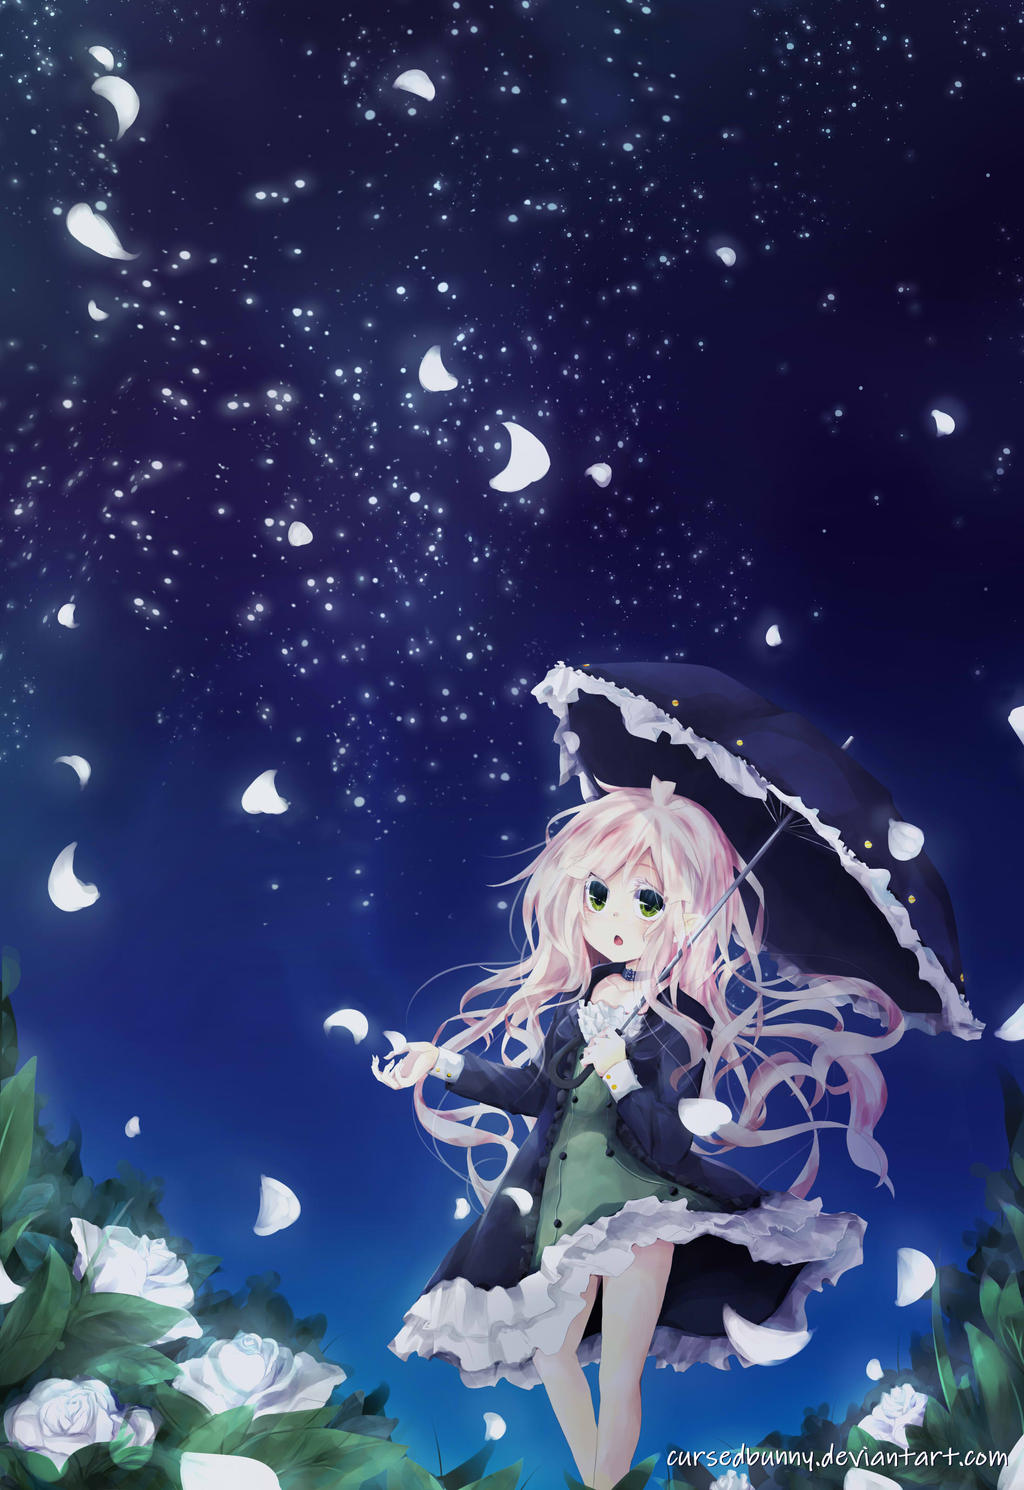 Starry night anime wallpaper